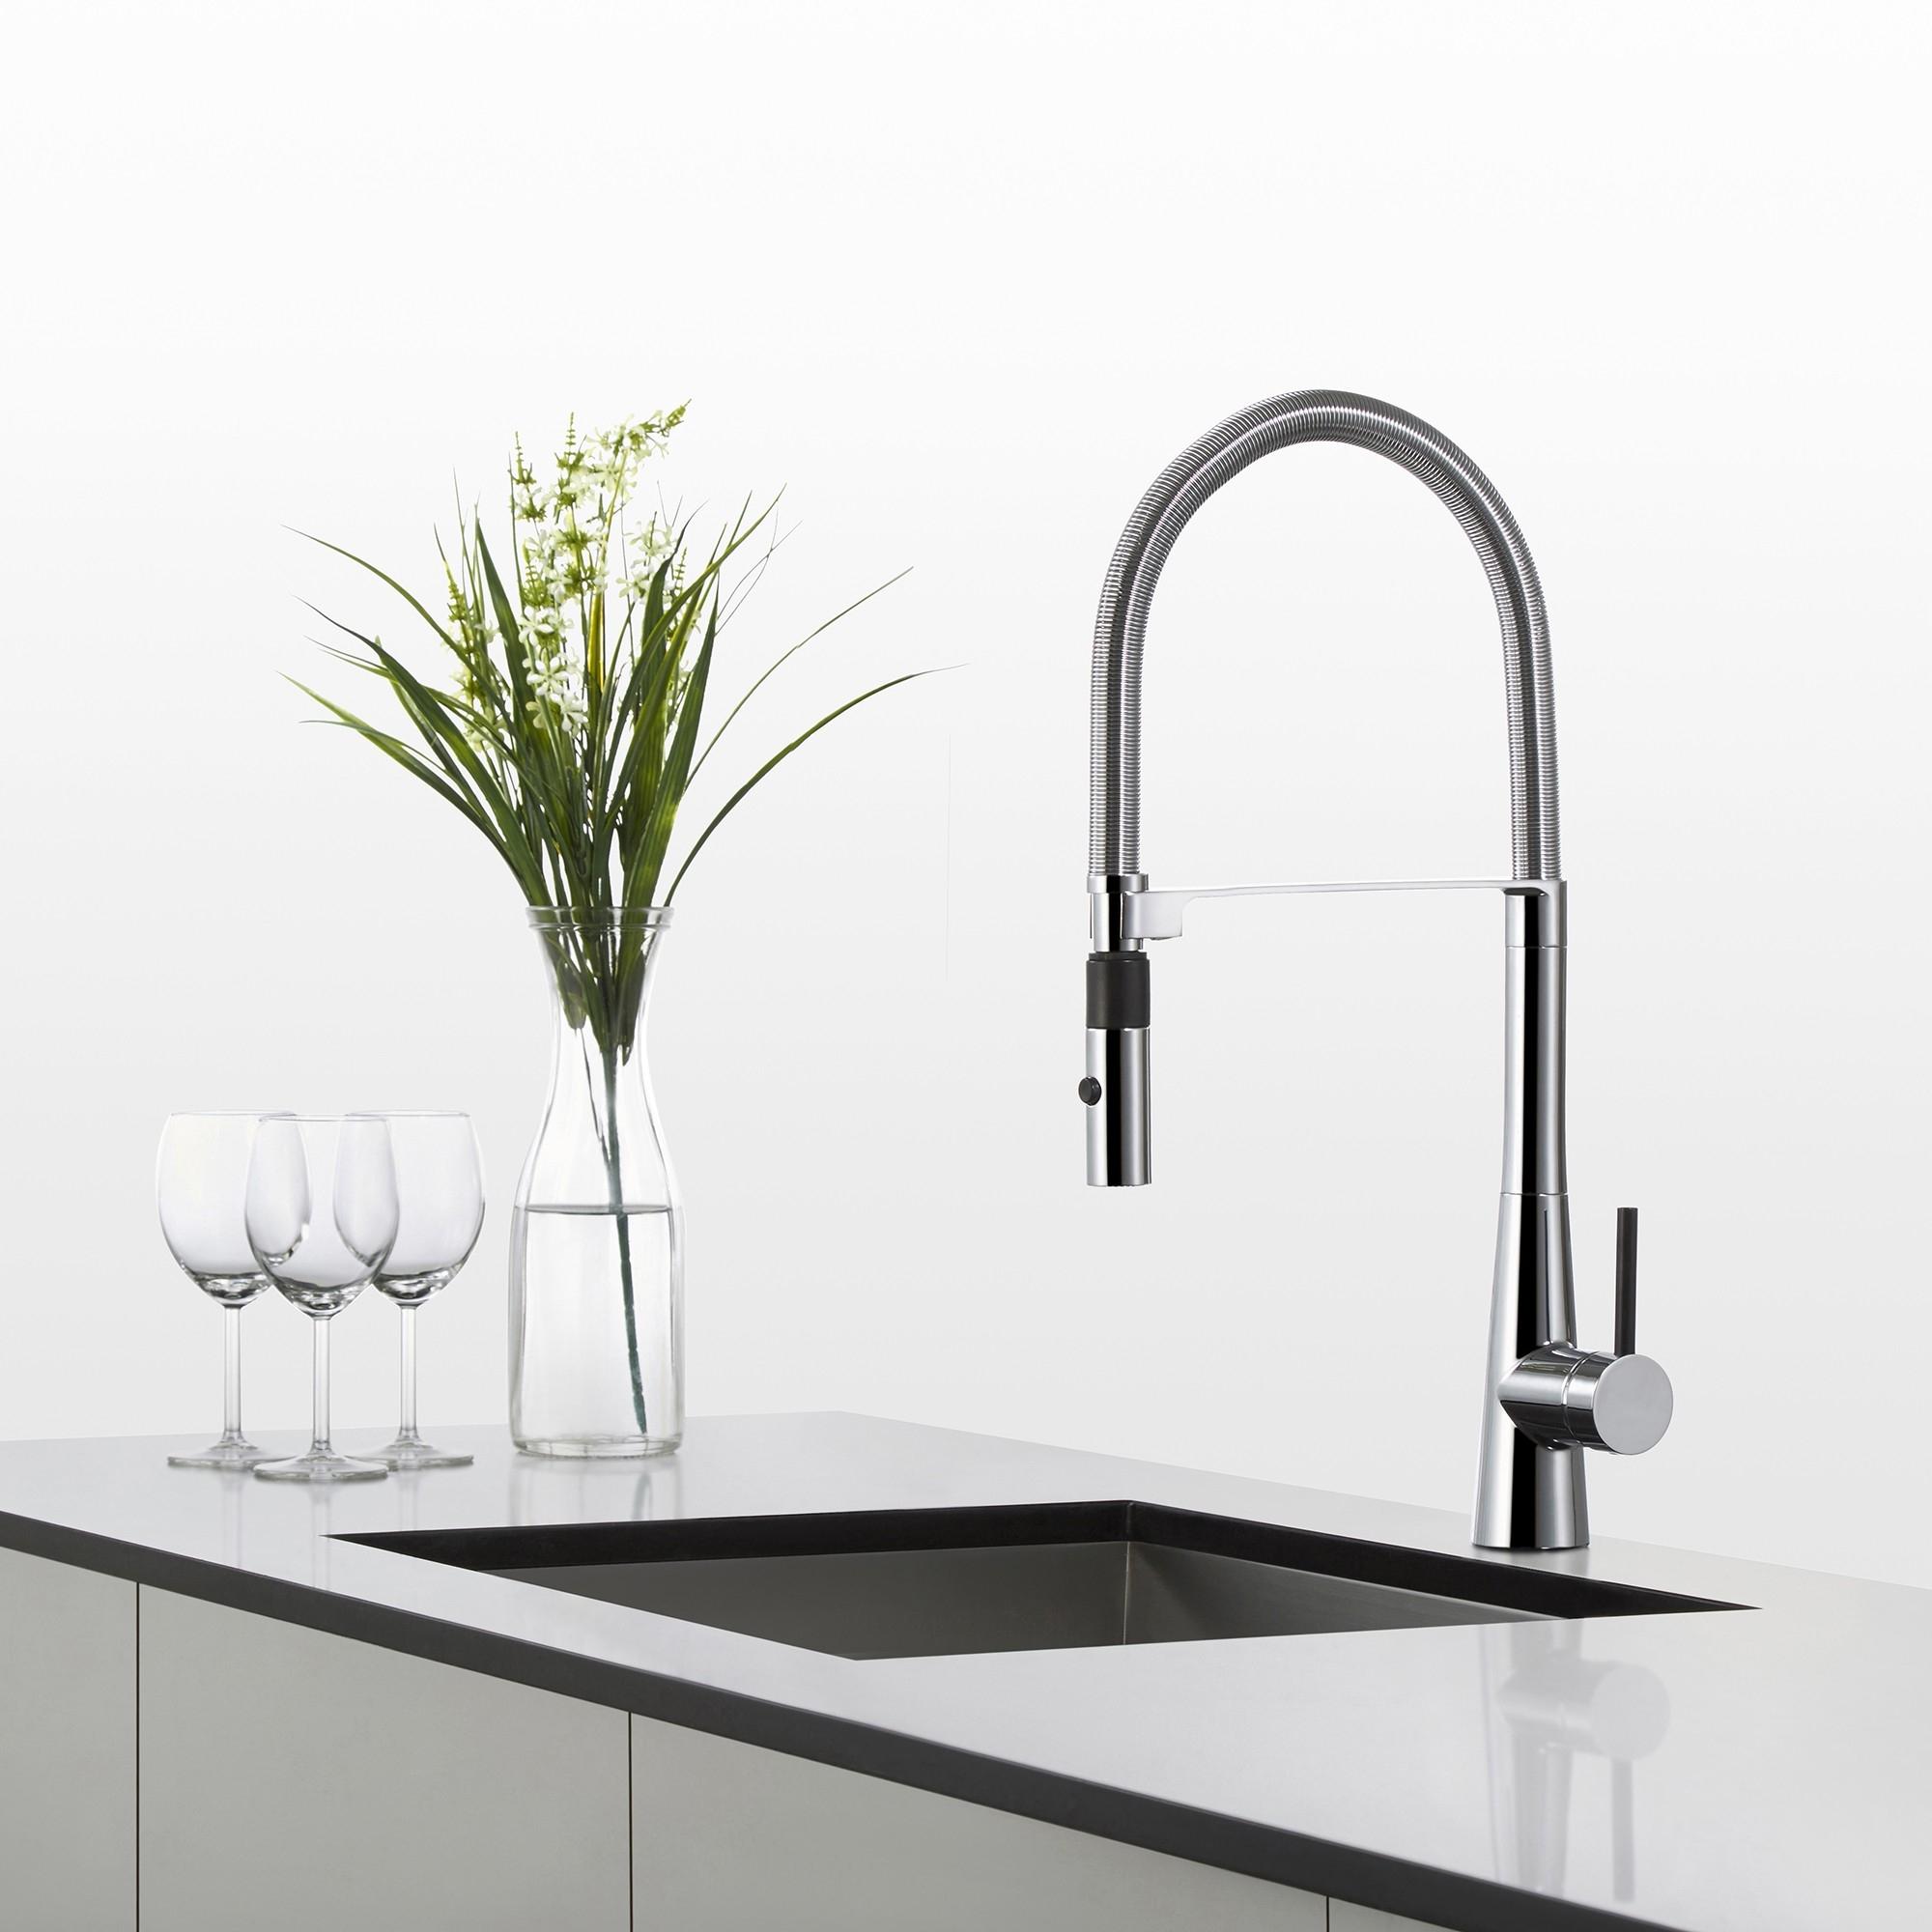 Ideas, kitchen faucet kraususa inside proportions 2000 x 2000 2  .